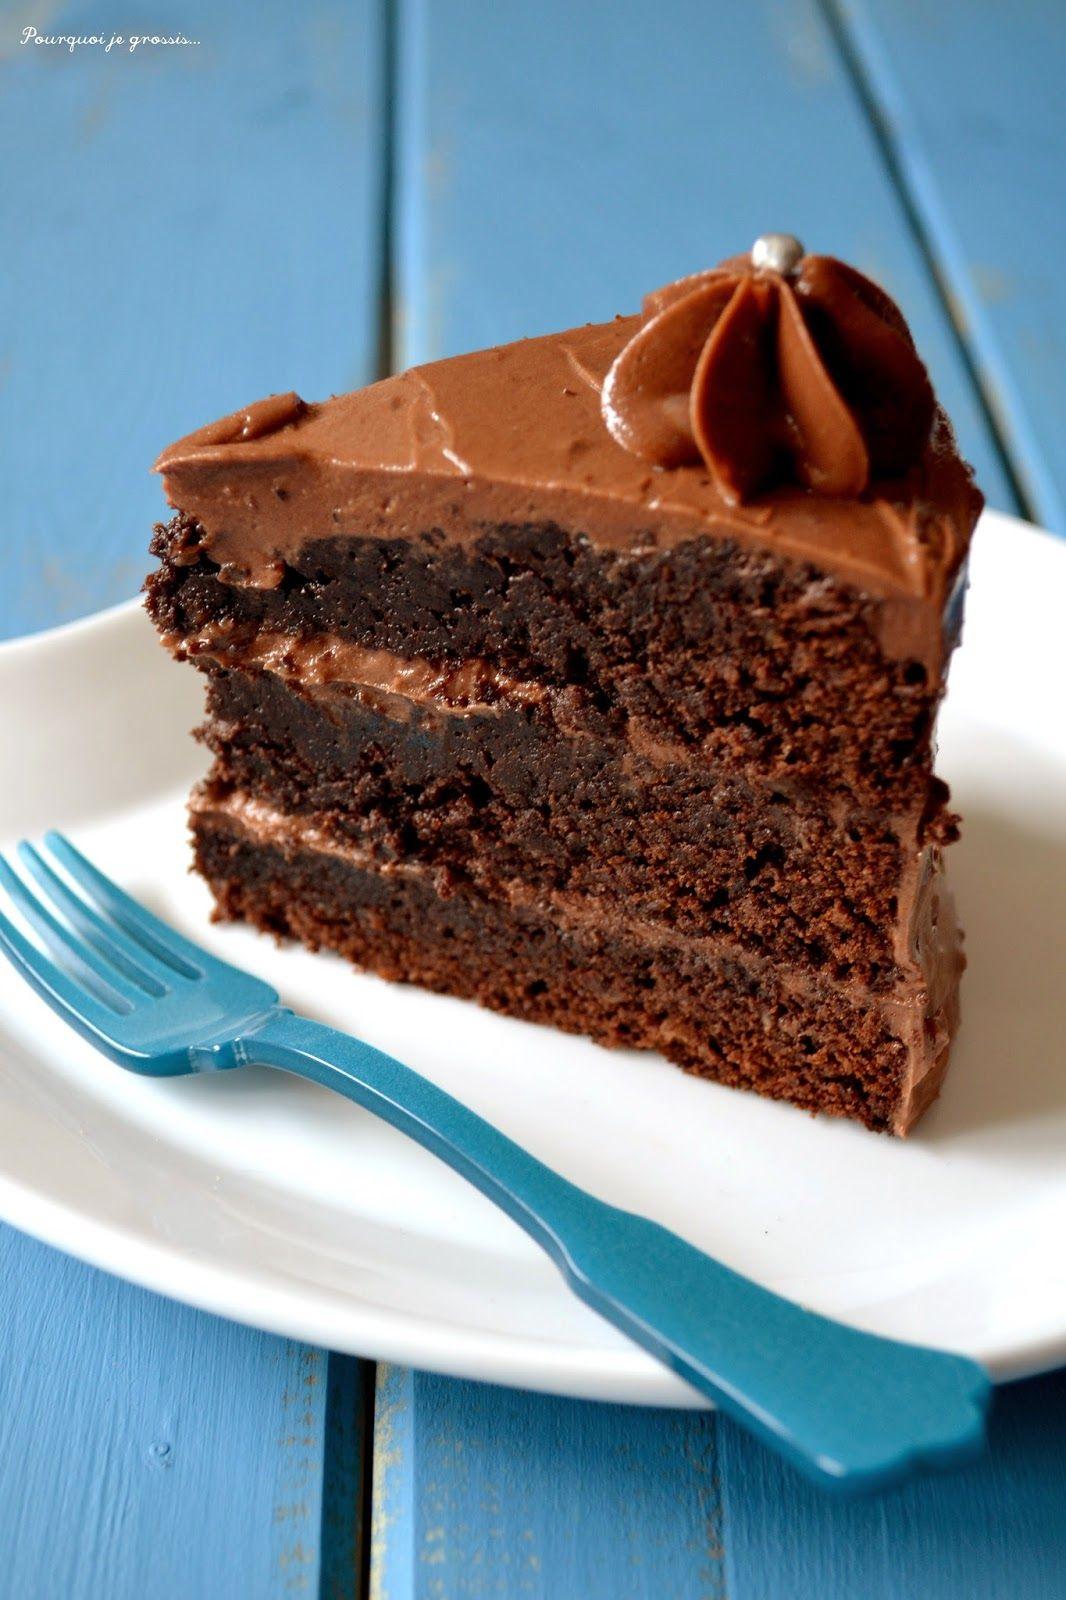 Pourquoi je grossis ... : Layer cake, saveur chocolat & praliné.